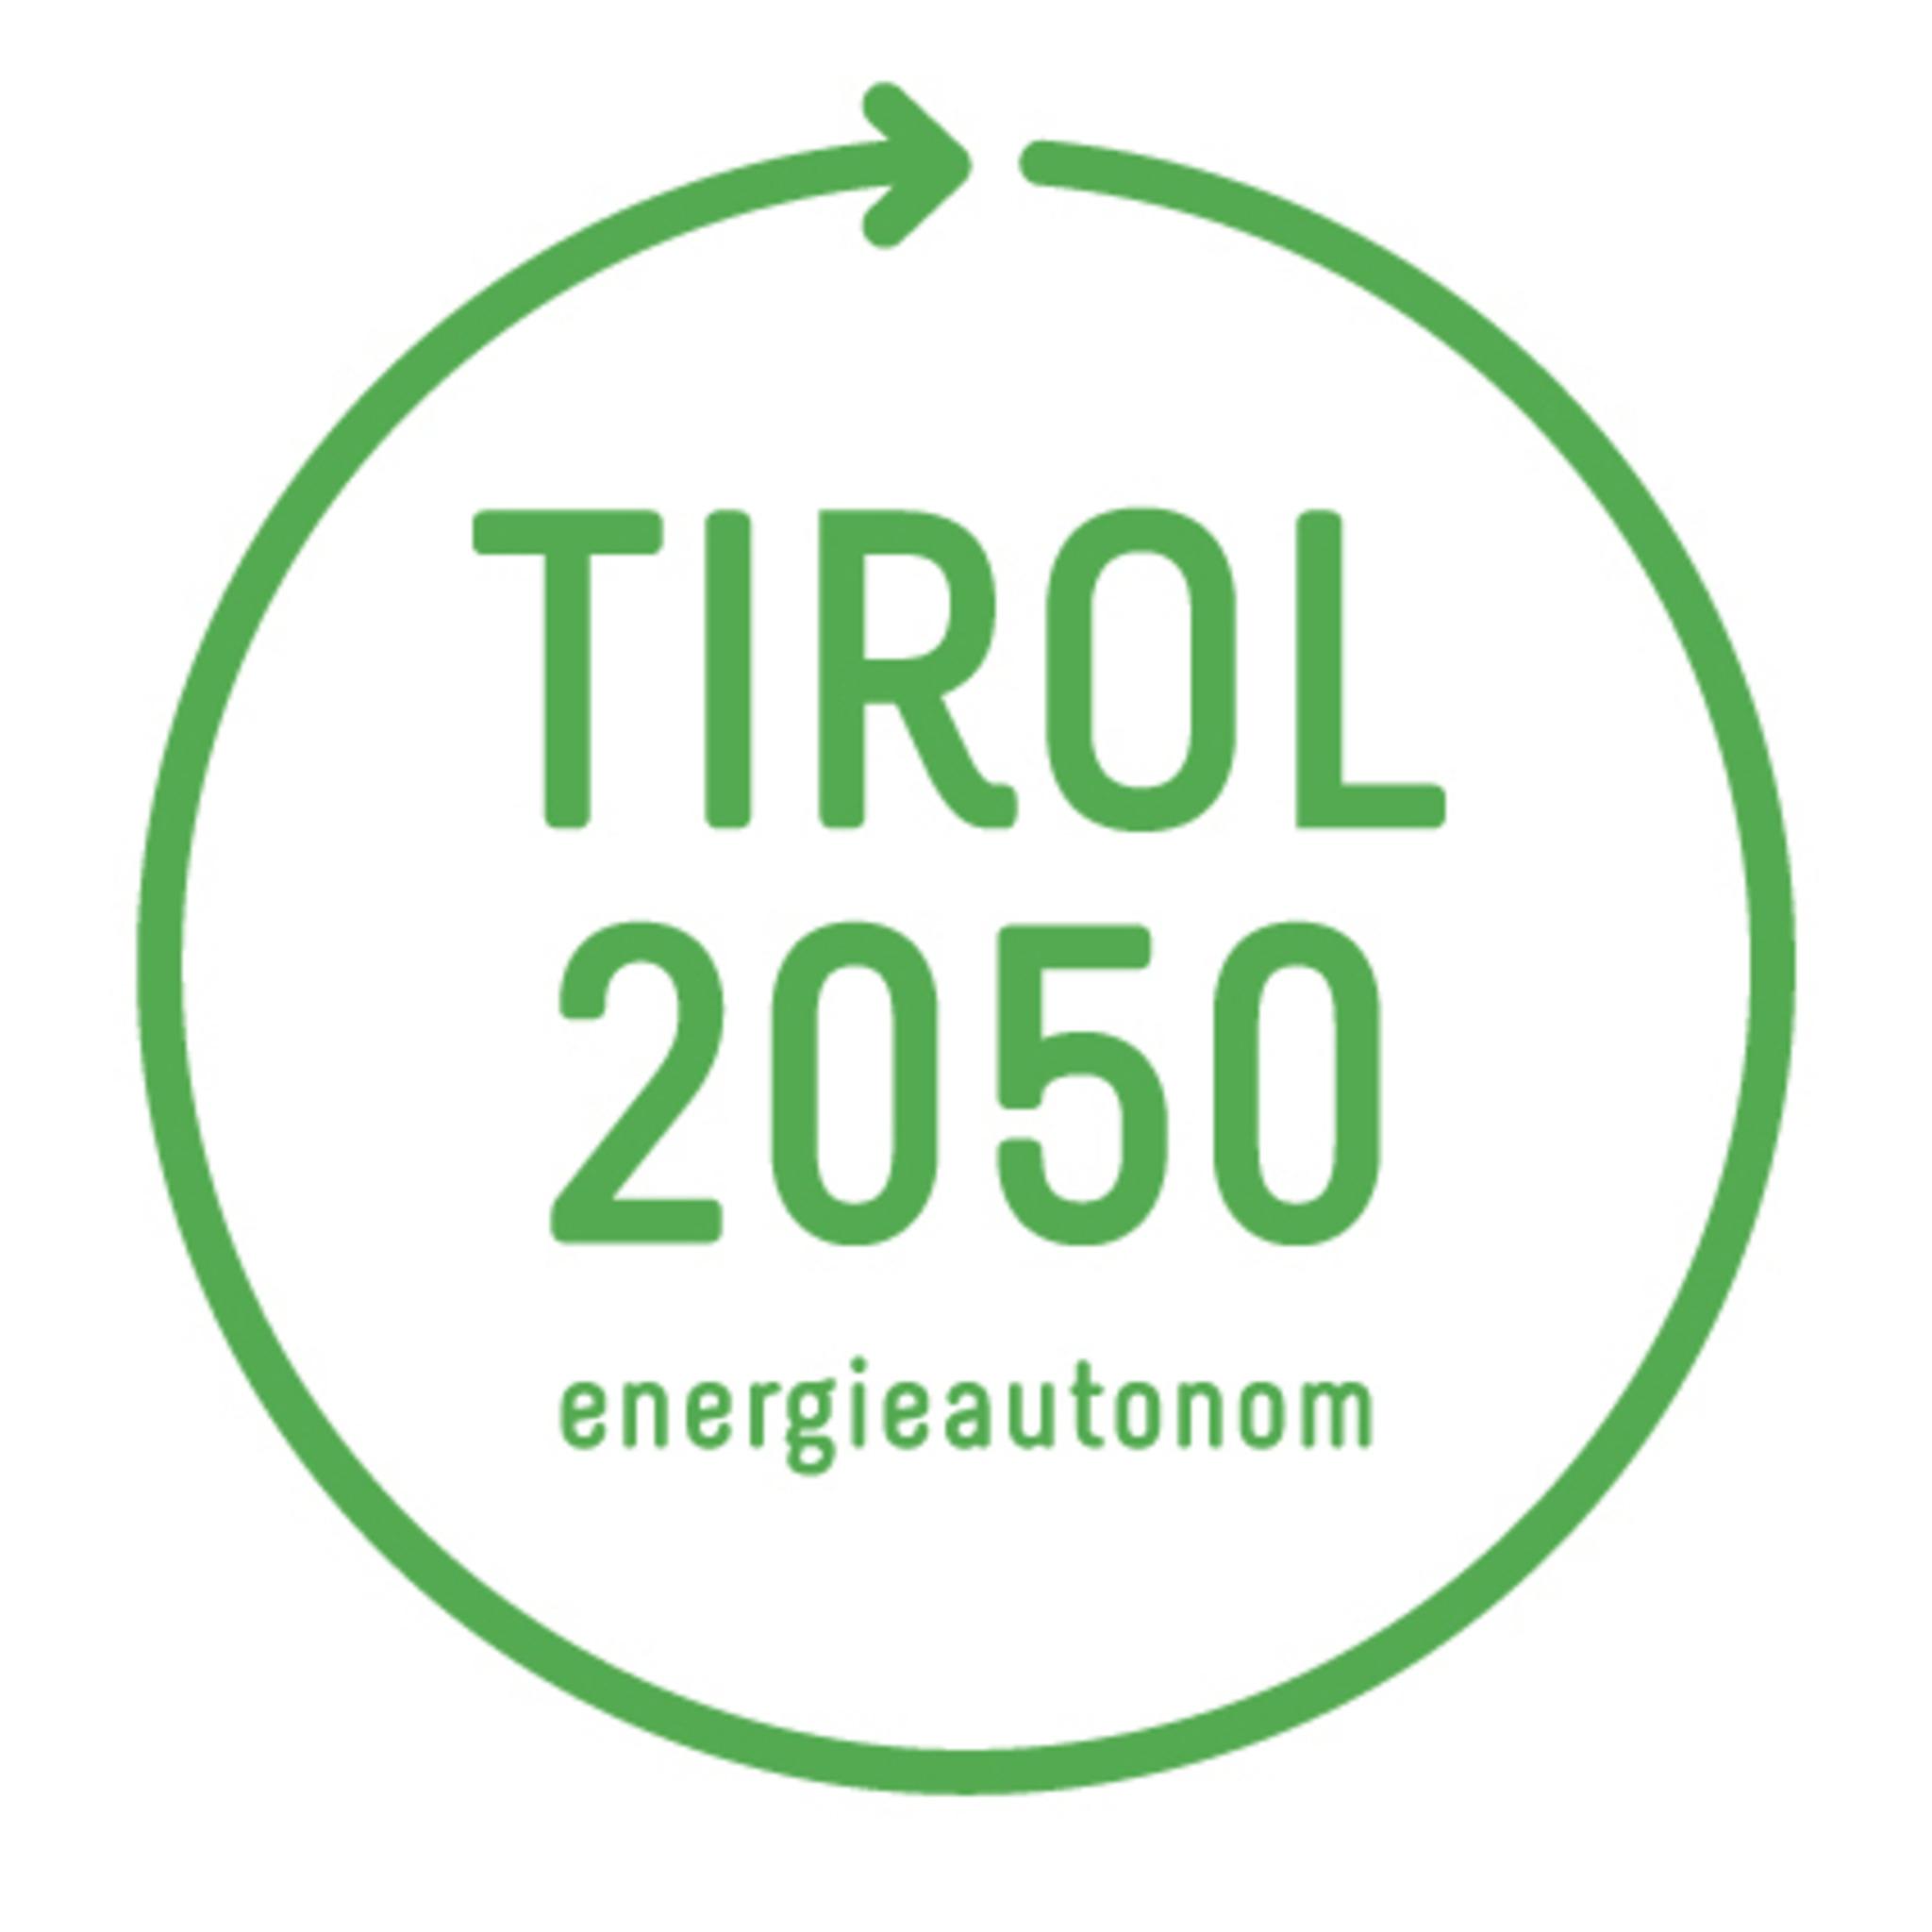 TIROL 2050 energiautonom - Reutte